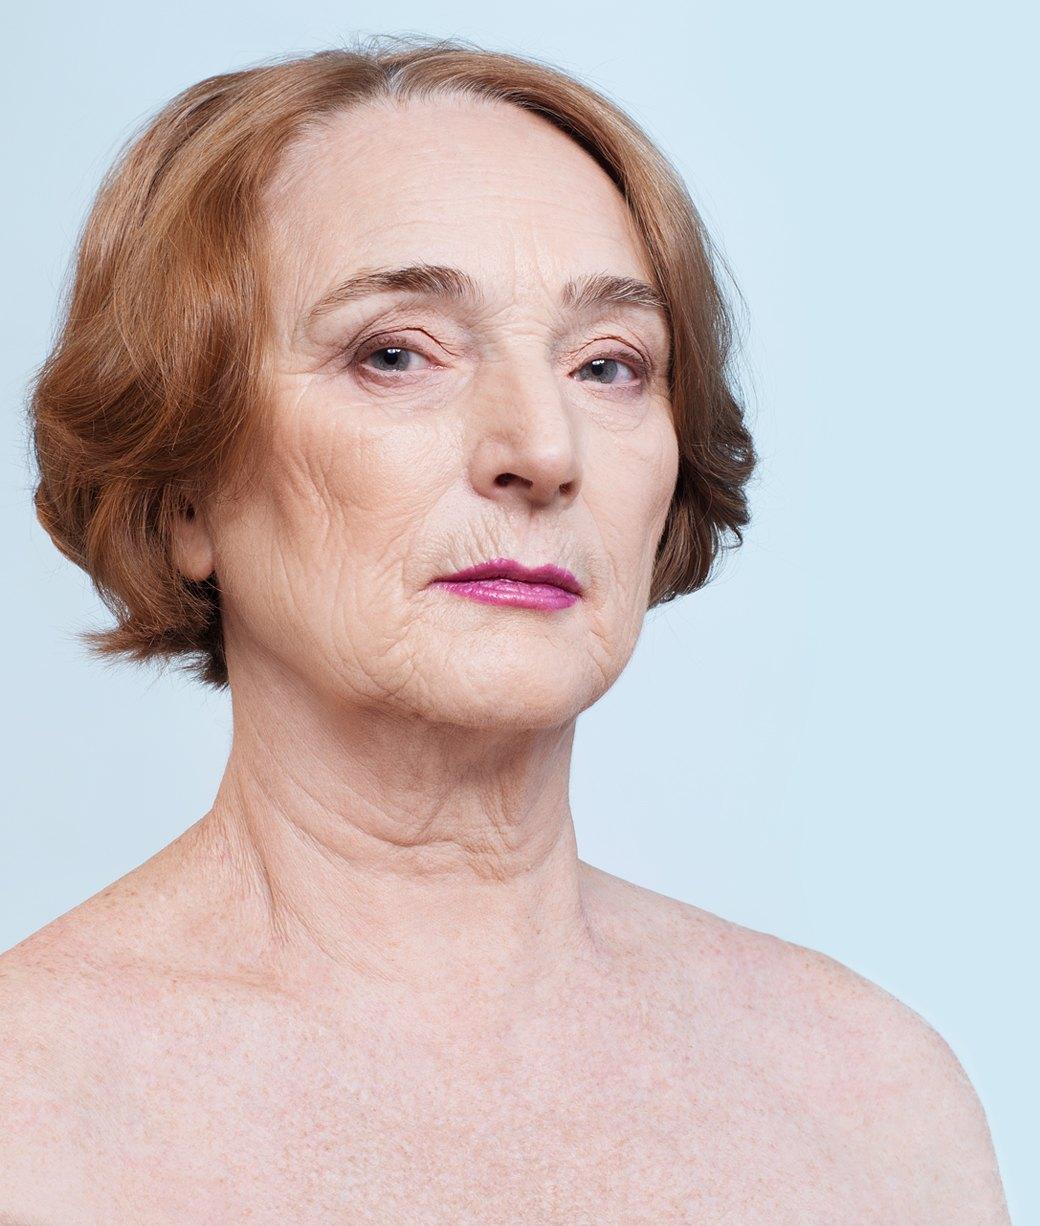 Сайт зрелых женщин 17 фотография